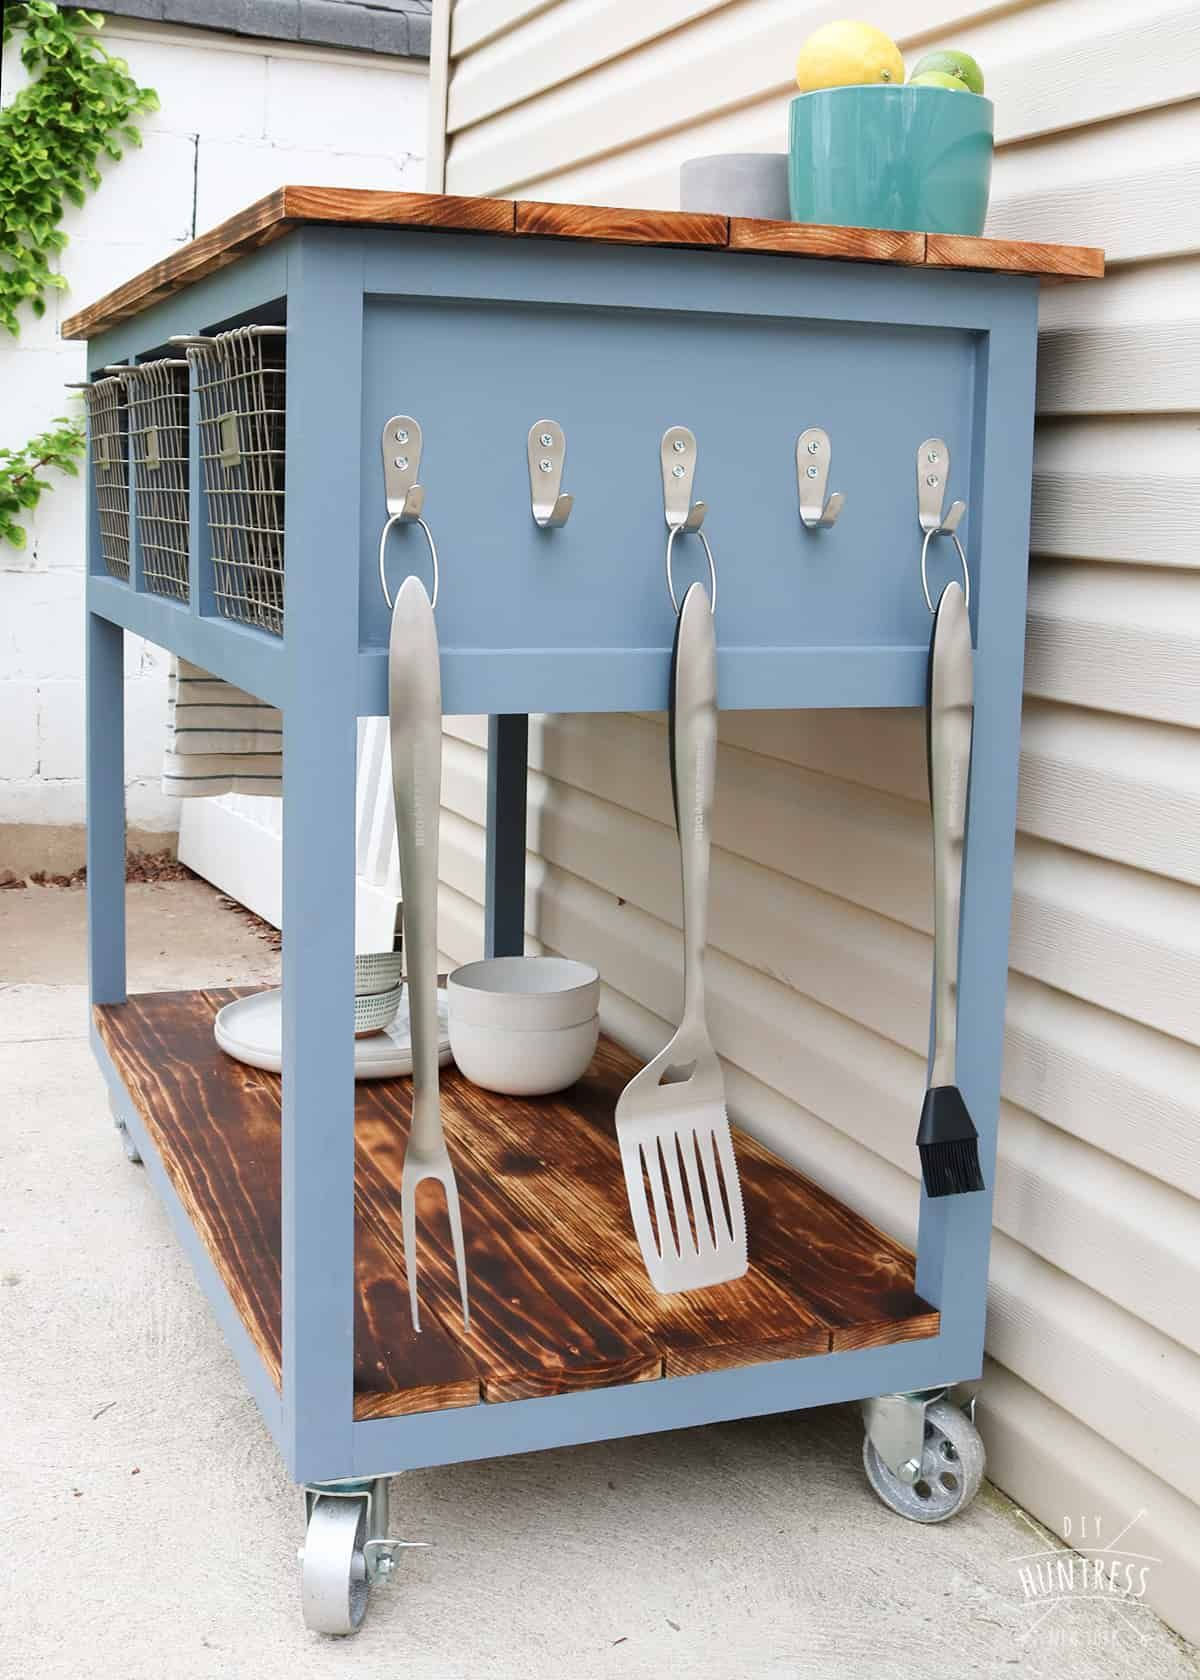 Diy mobile islandgrill cart grill cart mobile kitchen